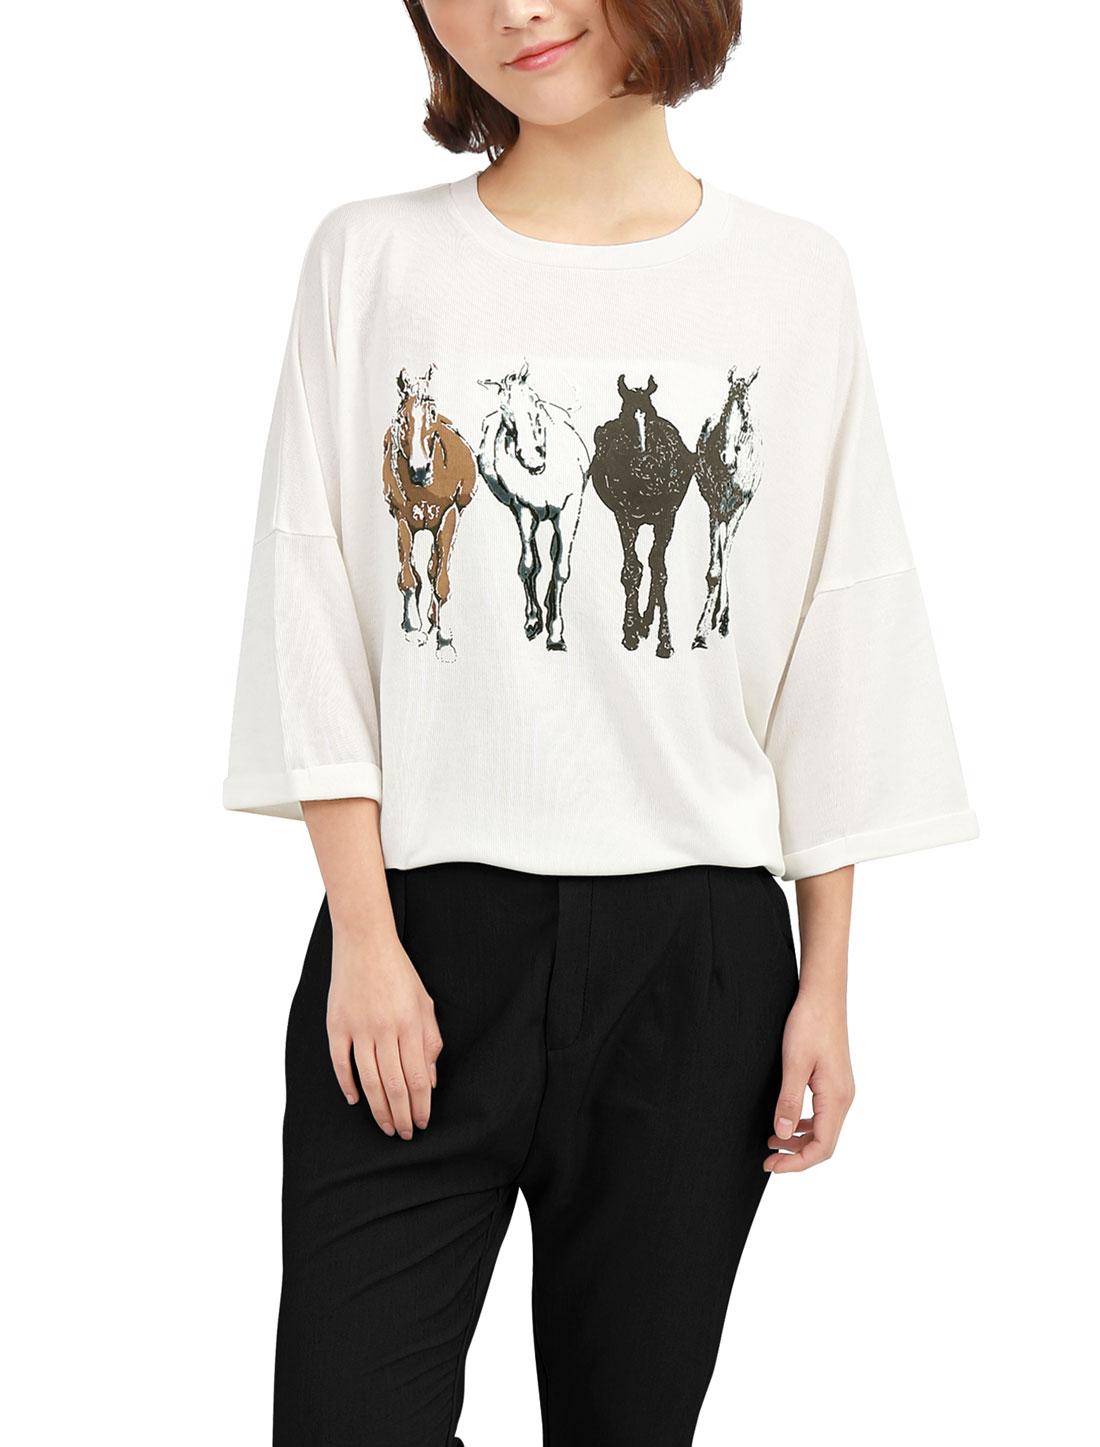 Allegra K Women Dolman Sleeve Horse T-shirt Tops Off White (Size M / 8)